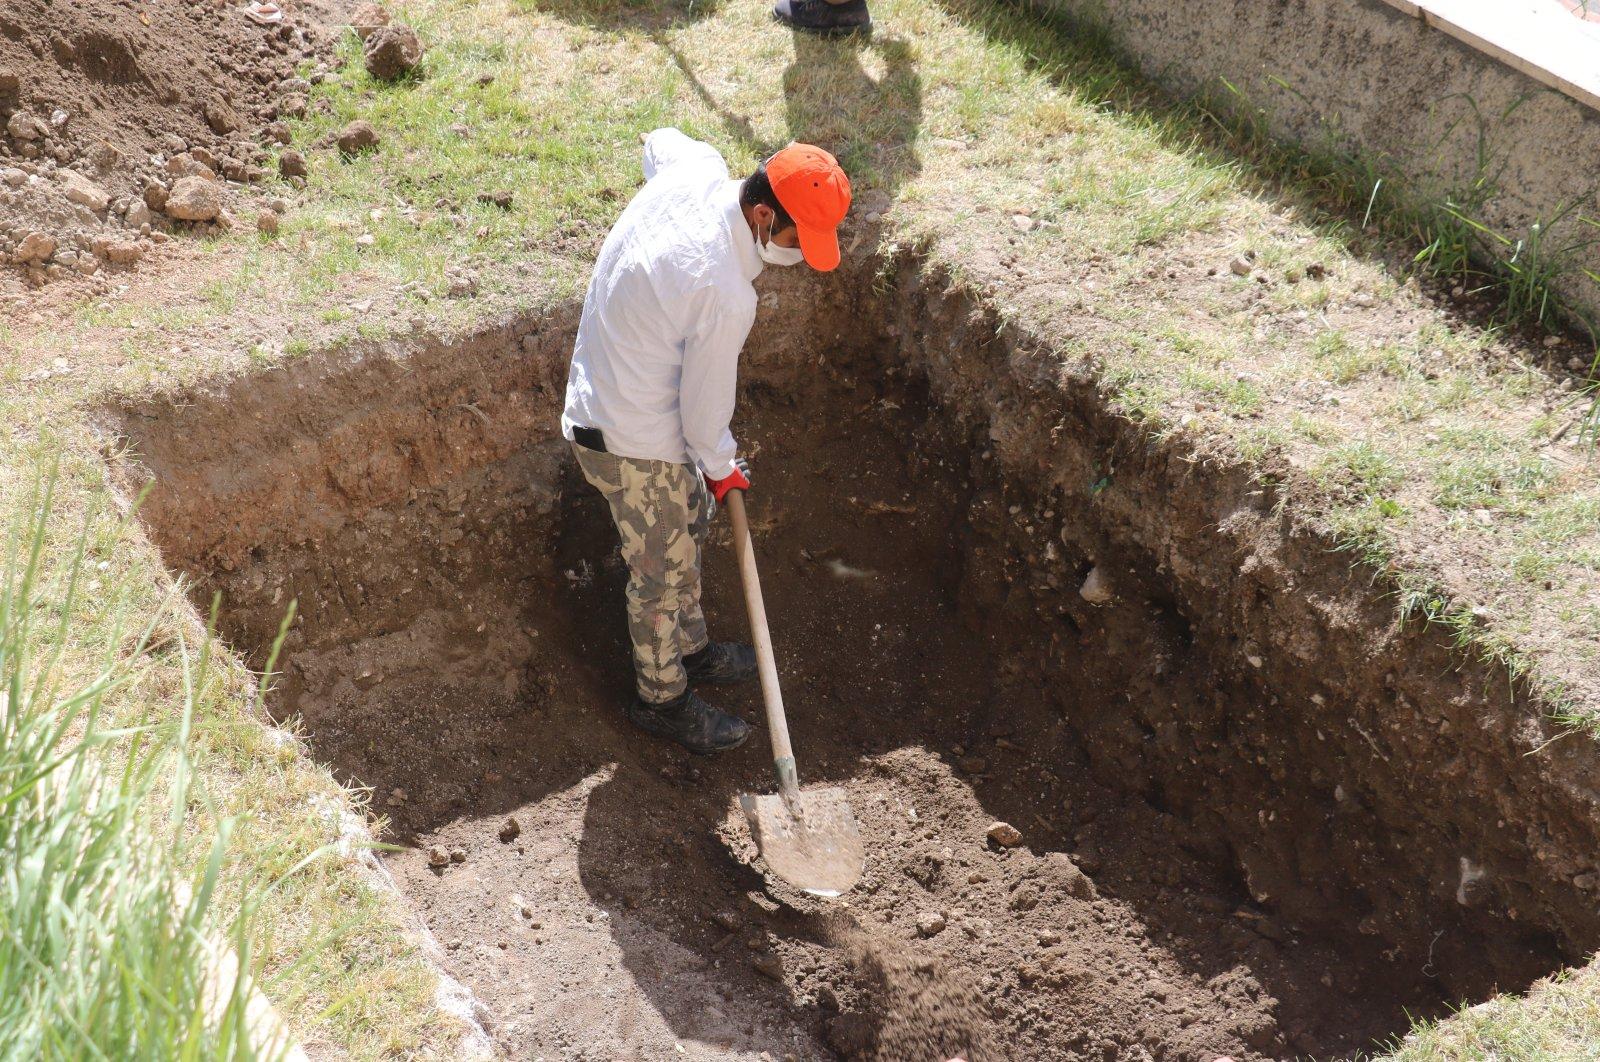 A worker digs in a presumed site of St. Vlas' grave, in Sivas, Turkey, June 17, 2020. (İHA Photo)